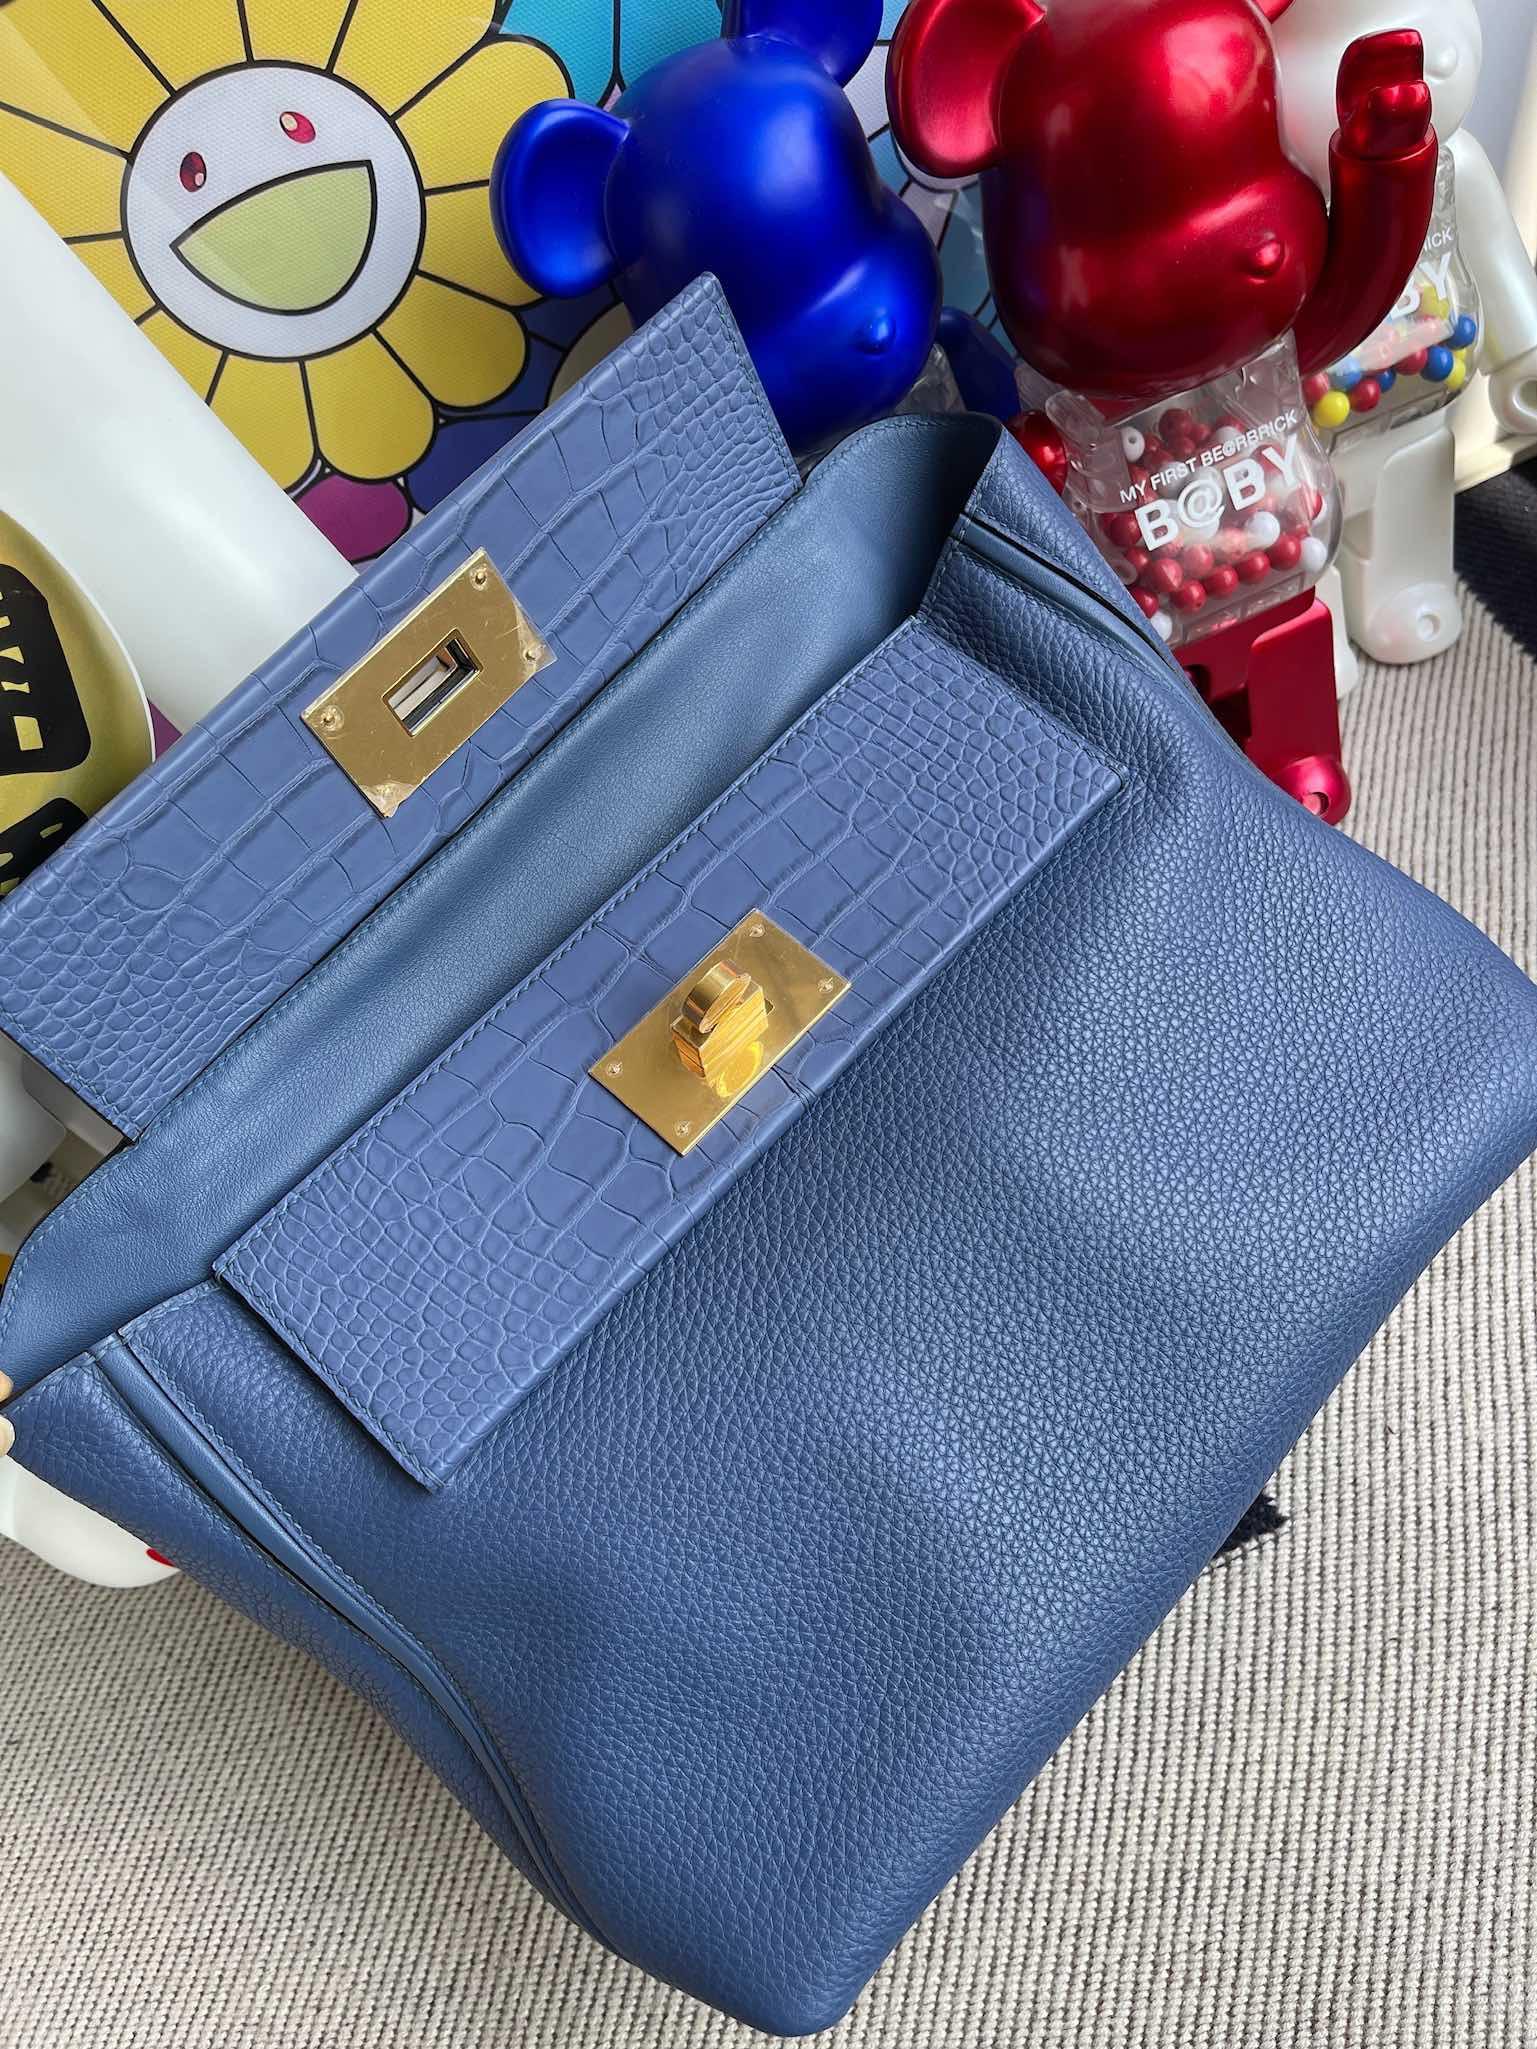 Hermès(爱马仕)Touch 系列 2424 29cm 明蓝色 雾面鳄 金扣 顶级手缝